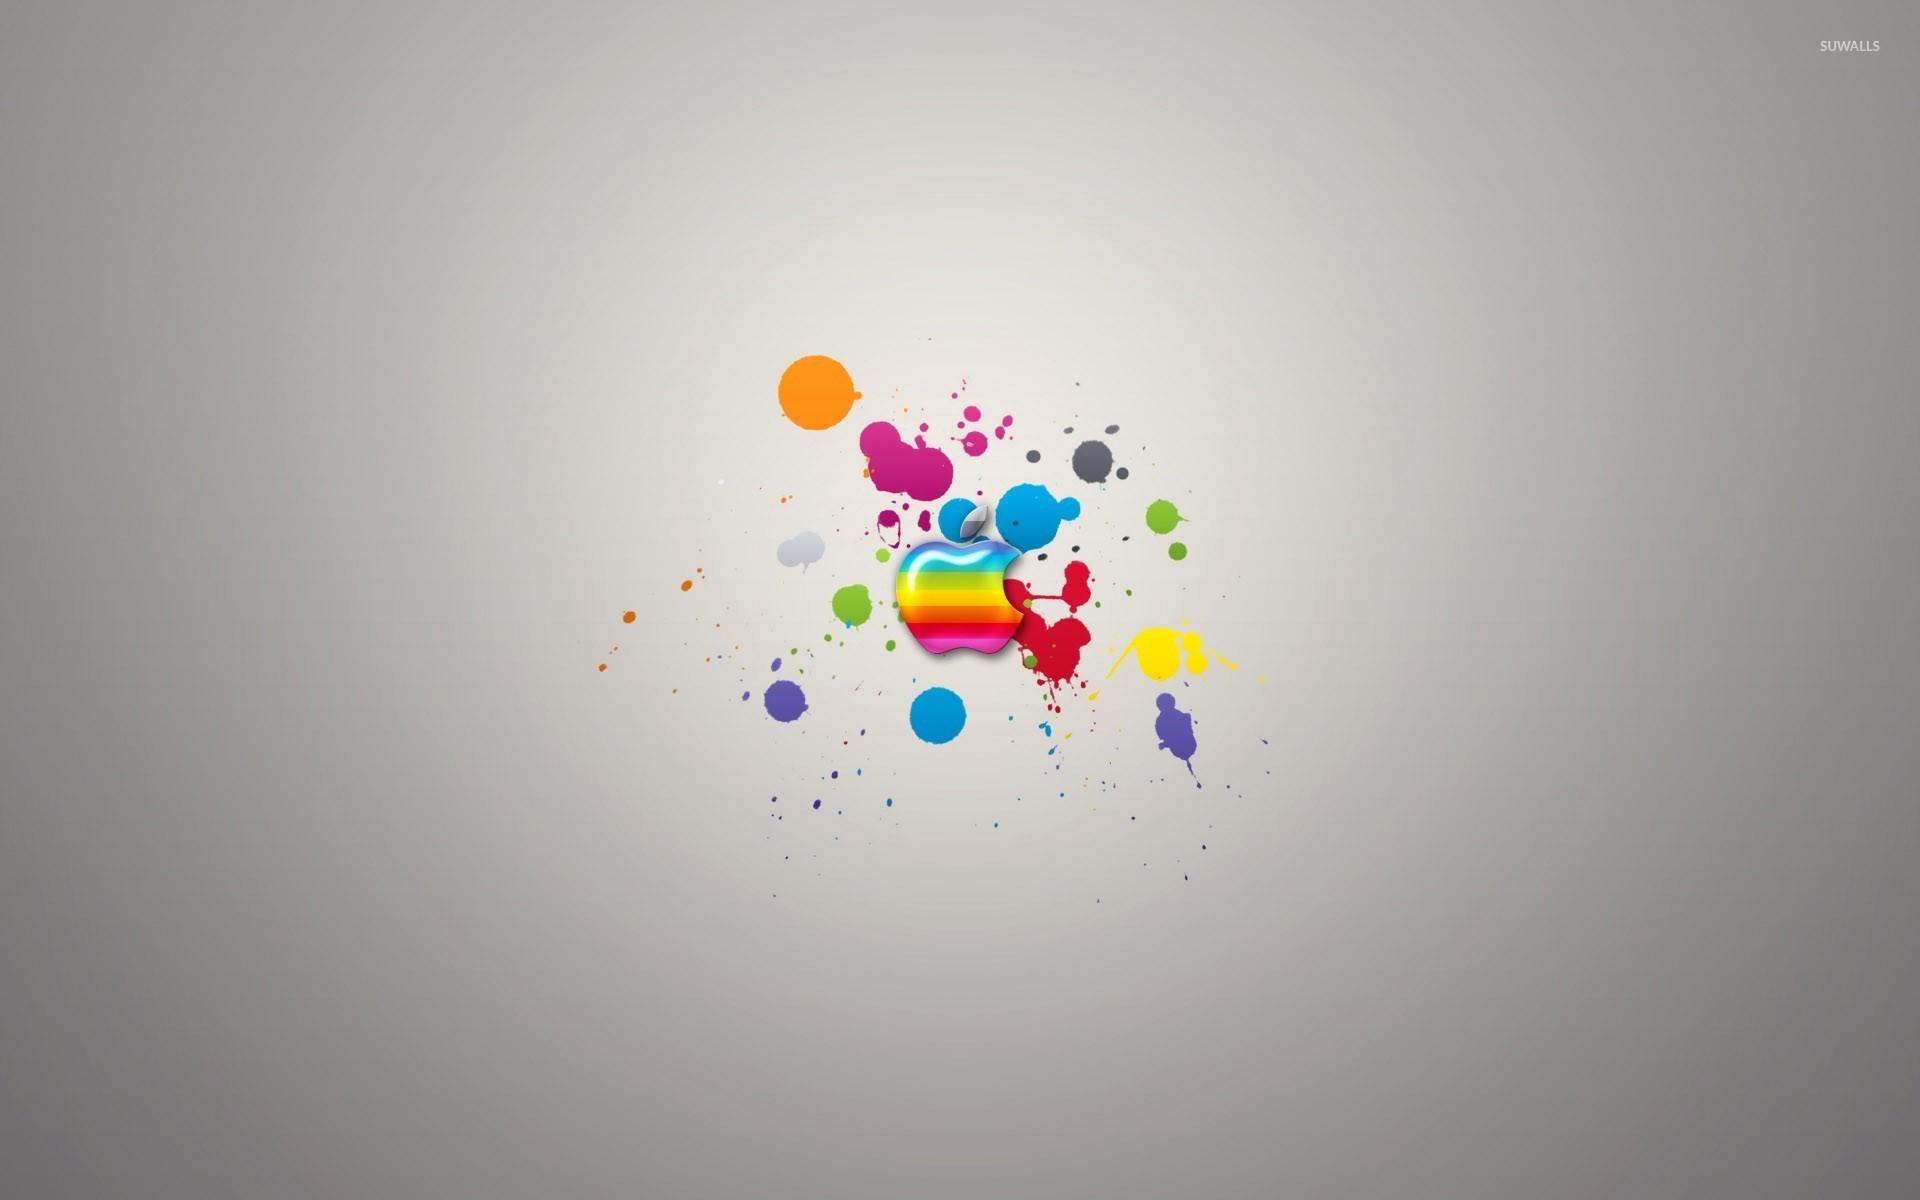 Colorful Apple On Paint Splash Wallpaper